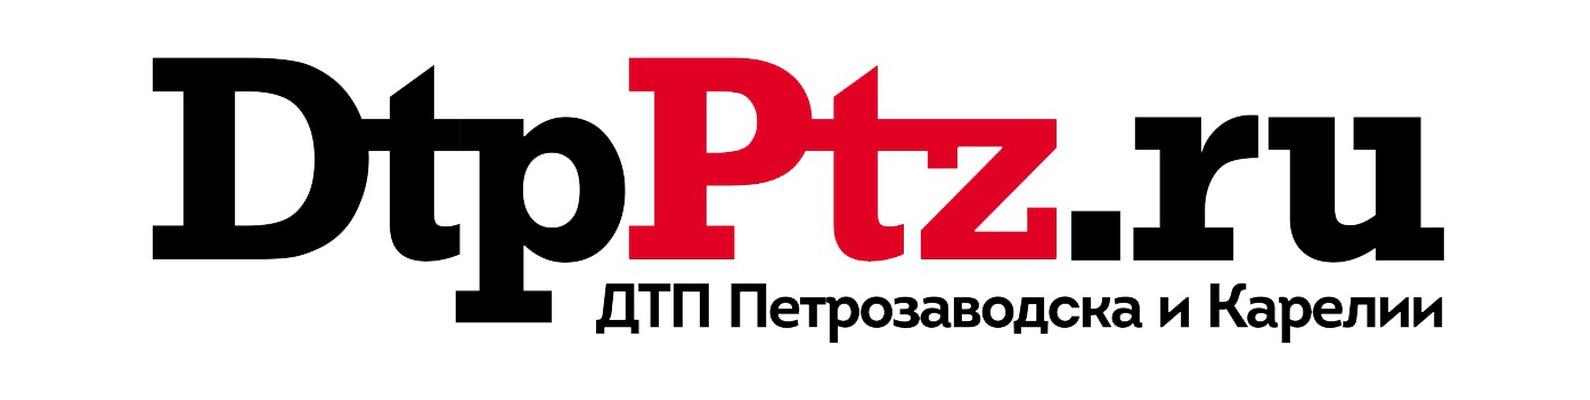 ДТП Петрозаводска и Карелии   ВКонтакте 5a5463fb2a5